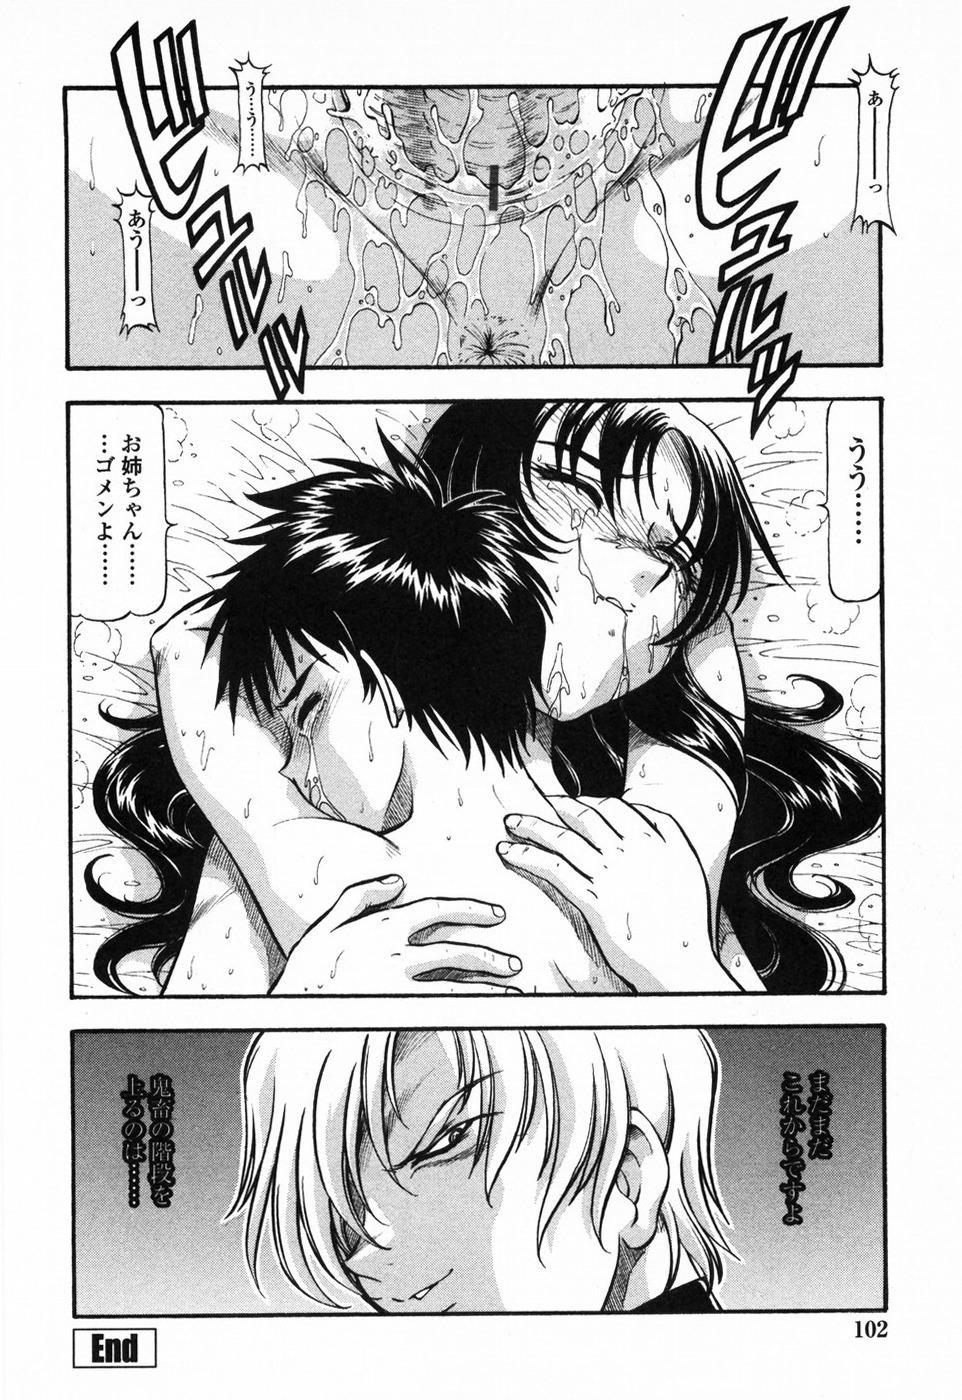 Kichiku Houteishiki - Equation of brutal person 107